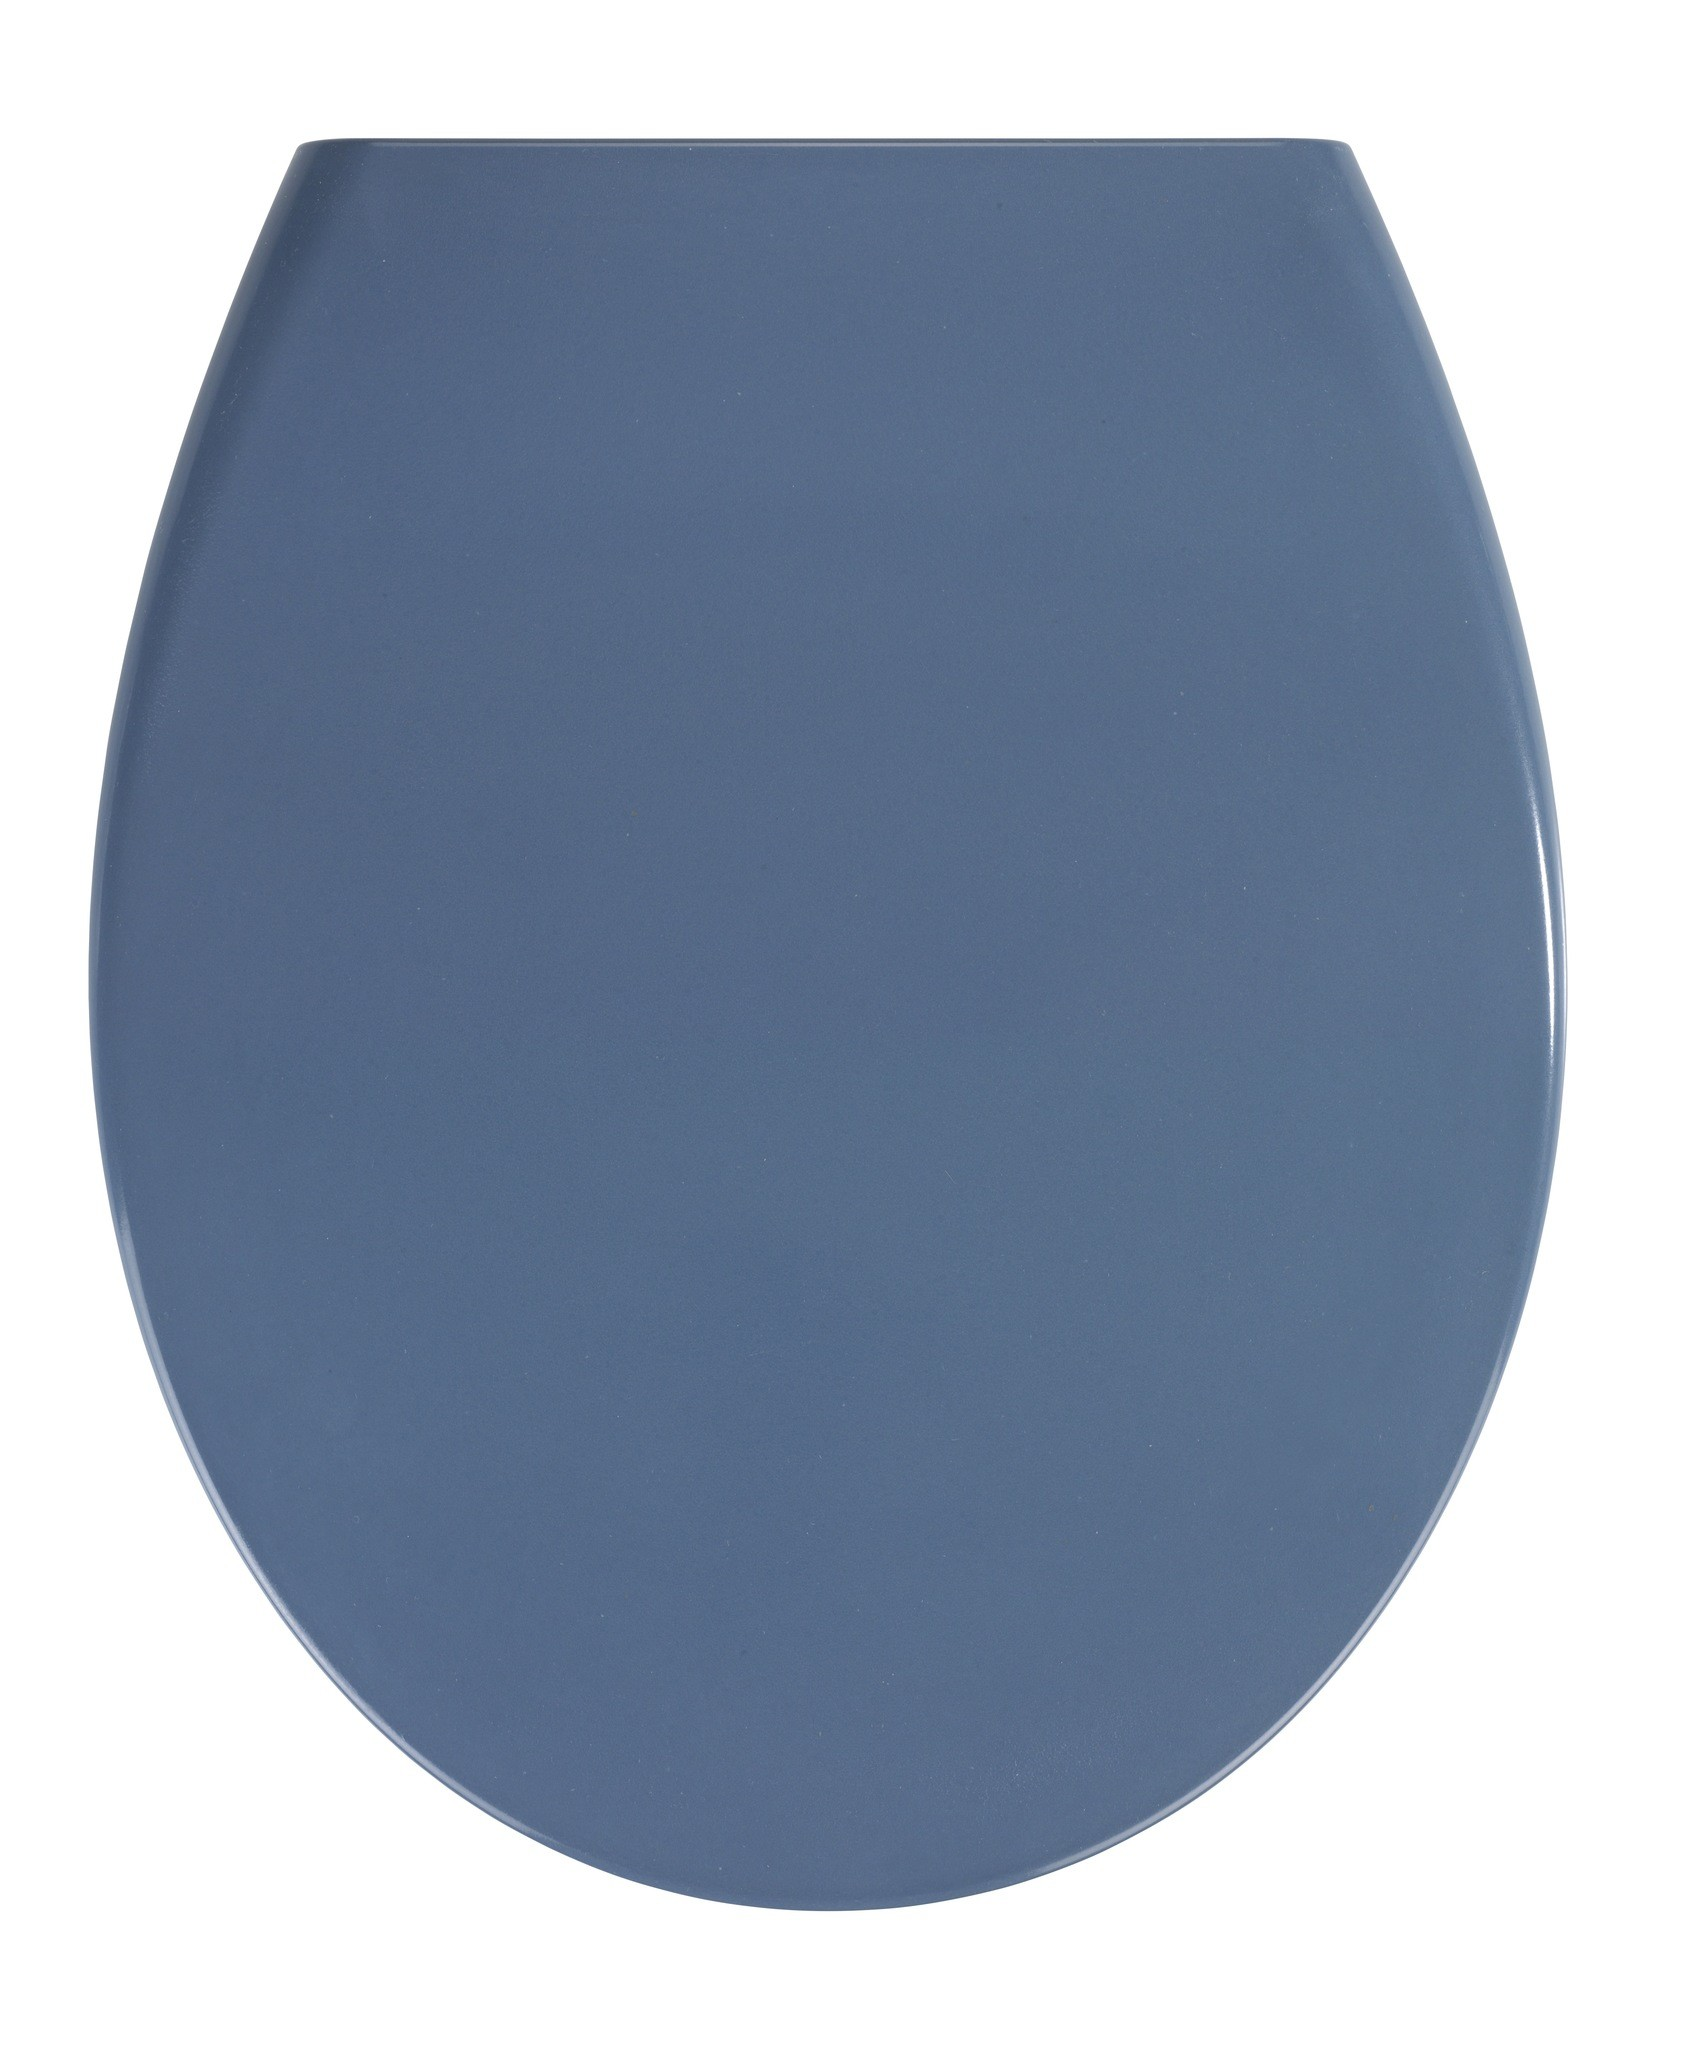 Premium WC-Sitz Samos Slate Blue, Duroplast, mit Absenkautomatik